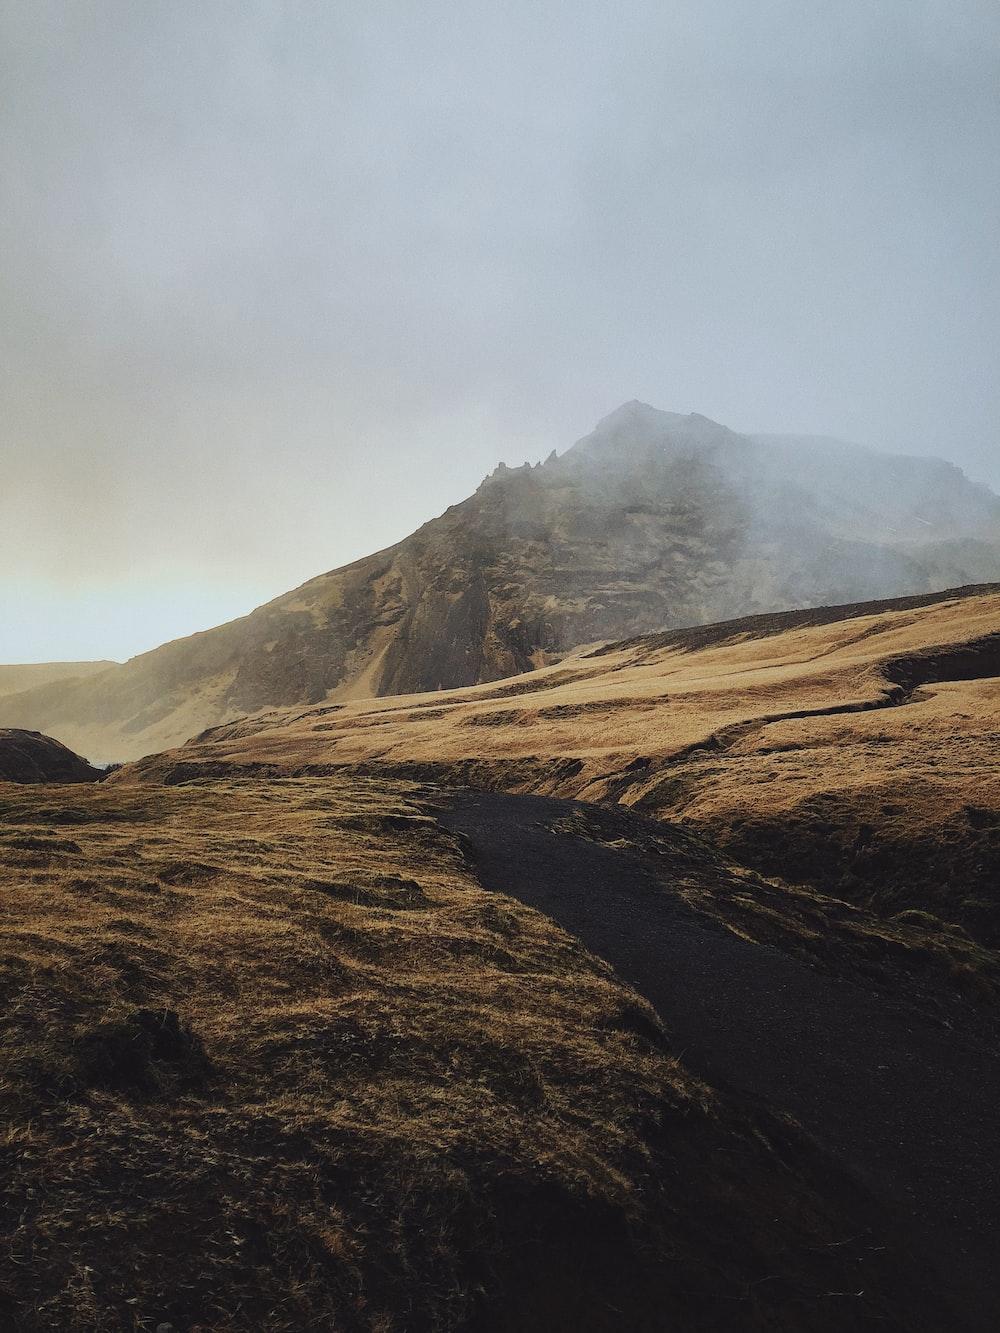 shallow focus photo of brown mountain